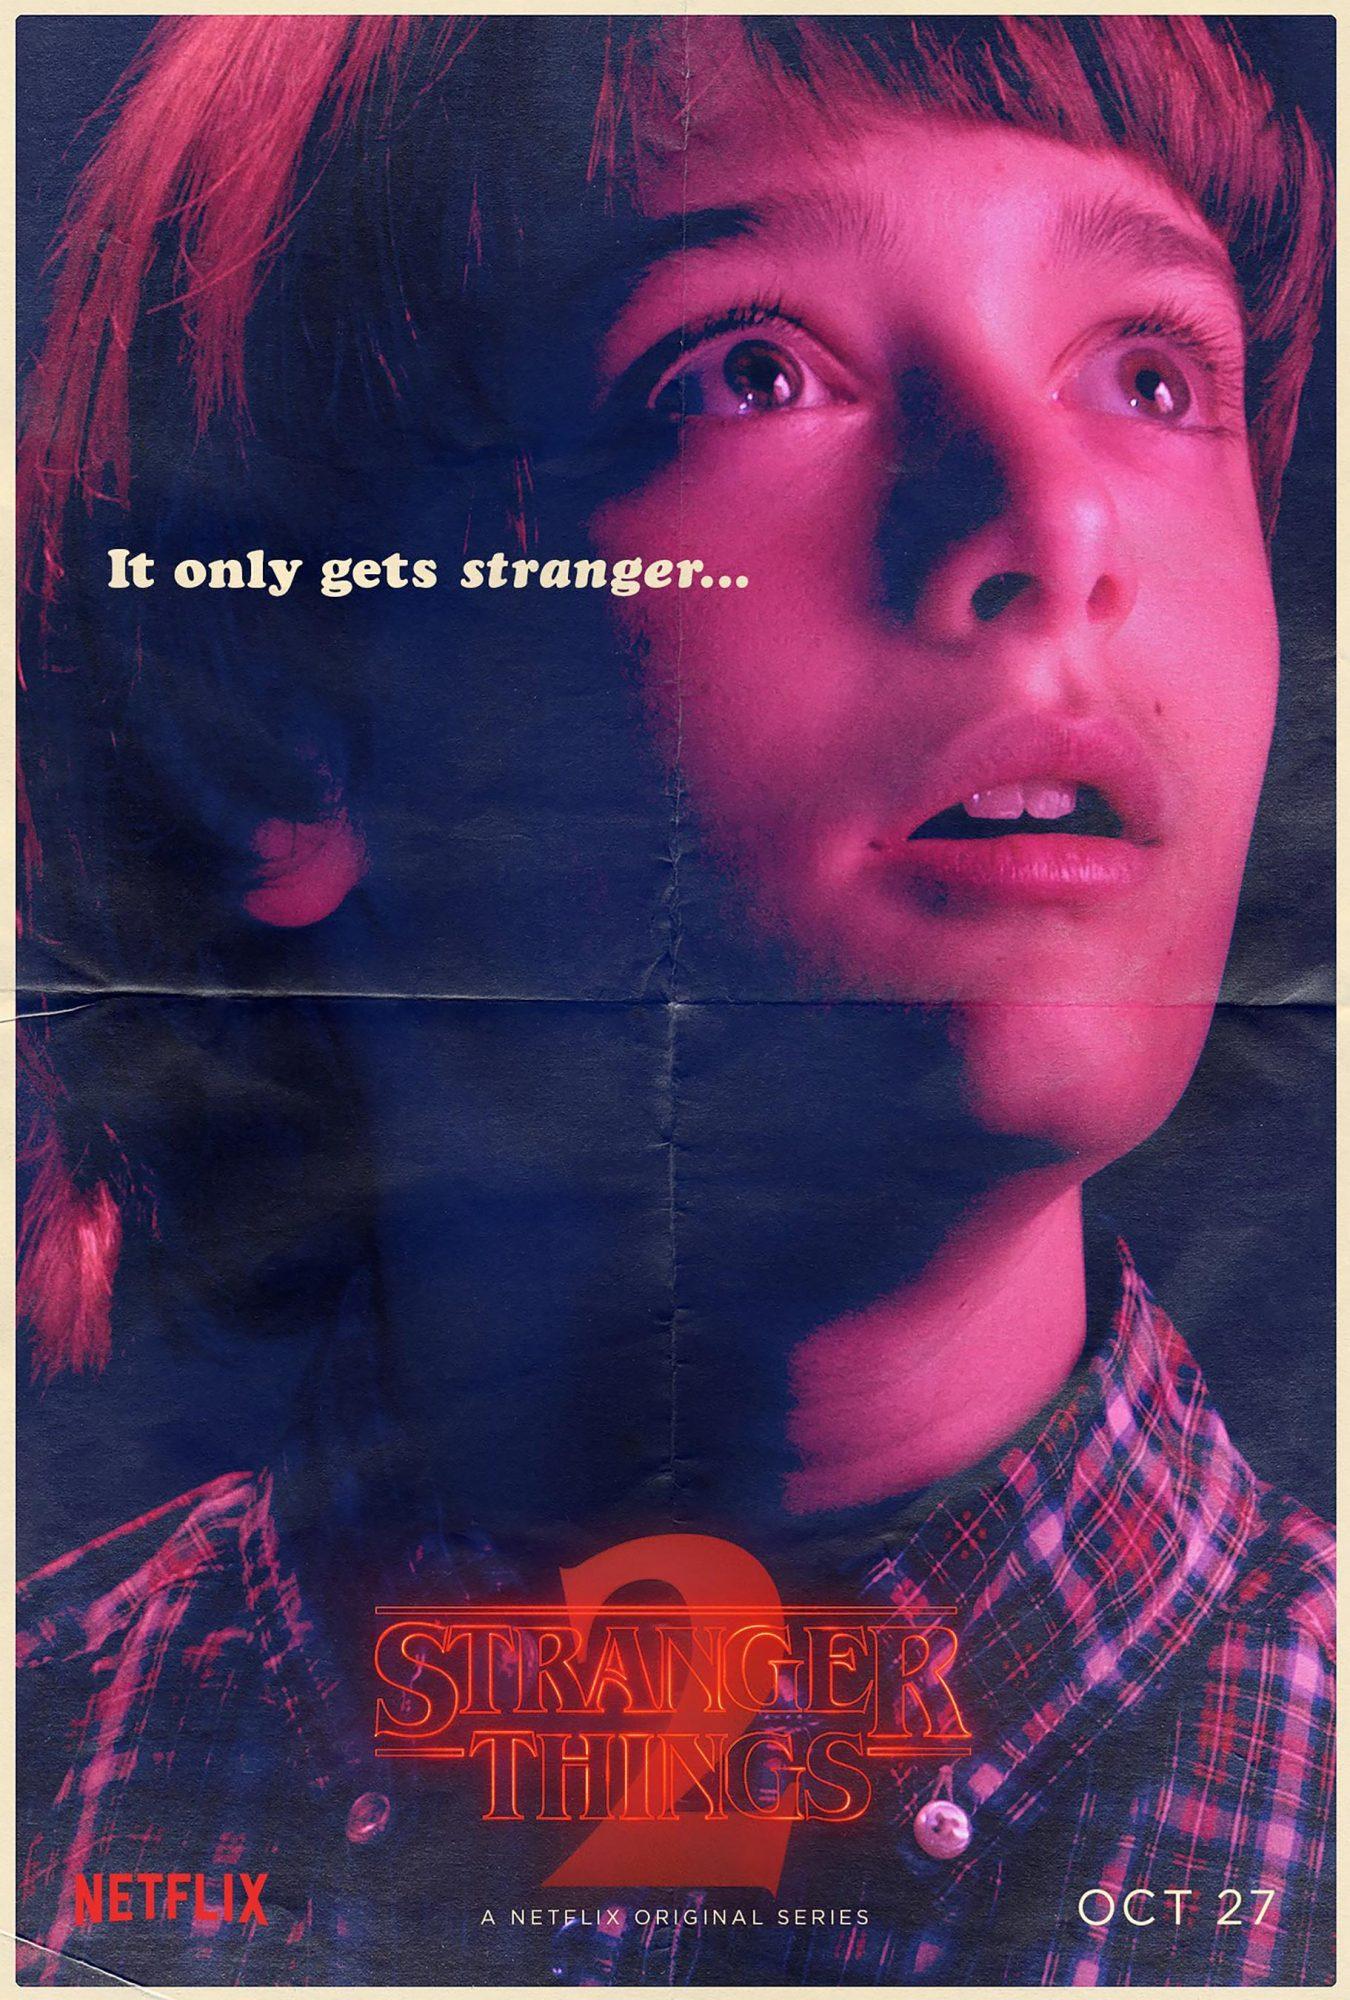 Stranger Things Season 2 - Noah Schnapp CR: Netflix